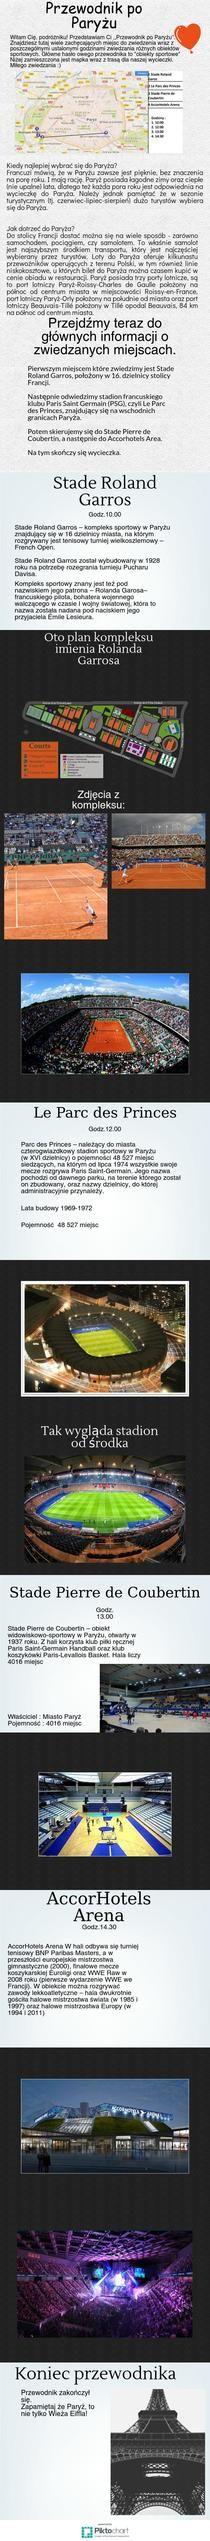 projekt k kozlowski | Piktochart Infographic Editor